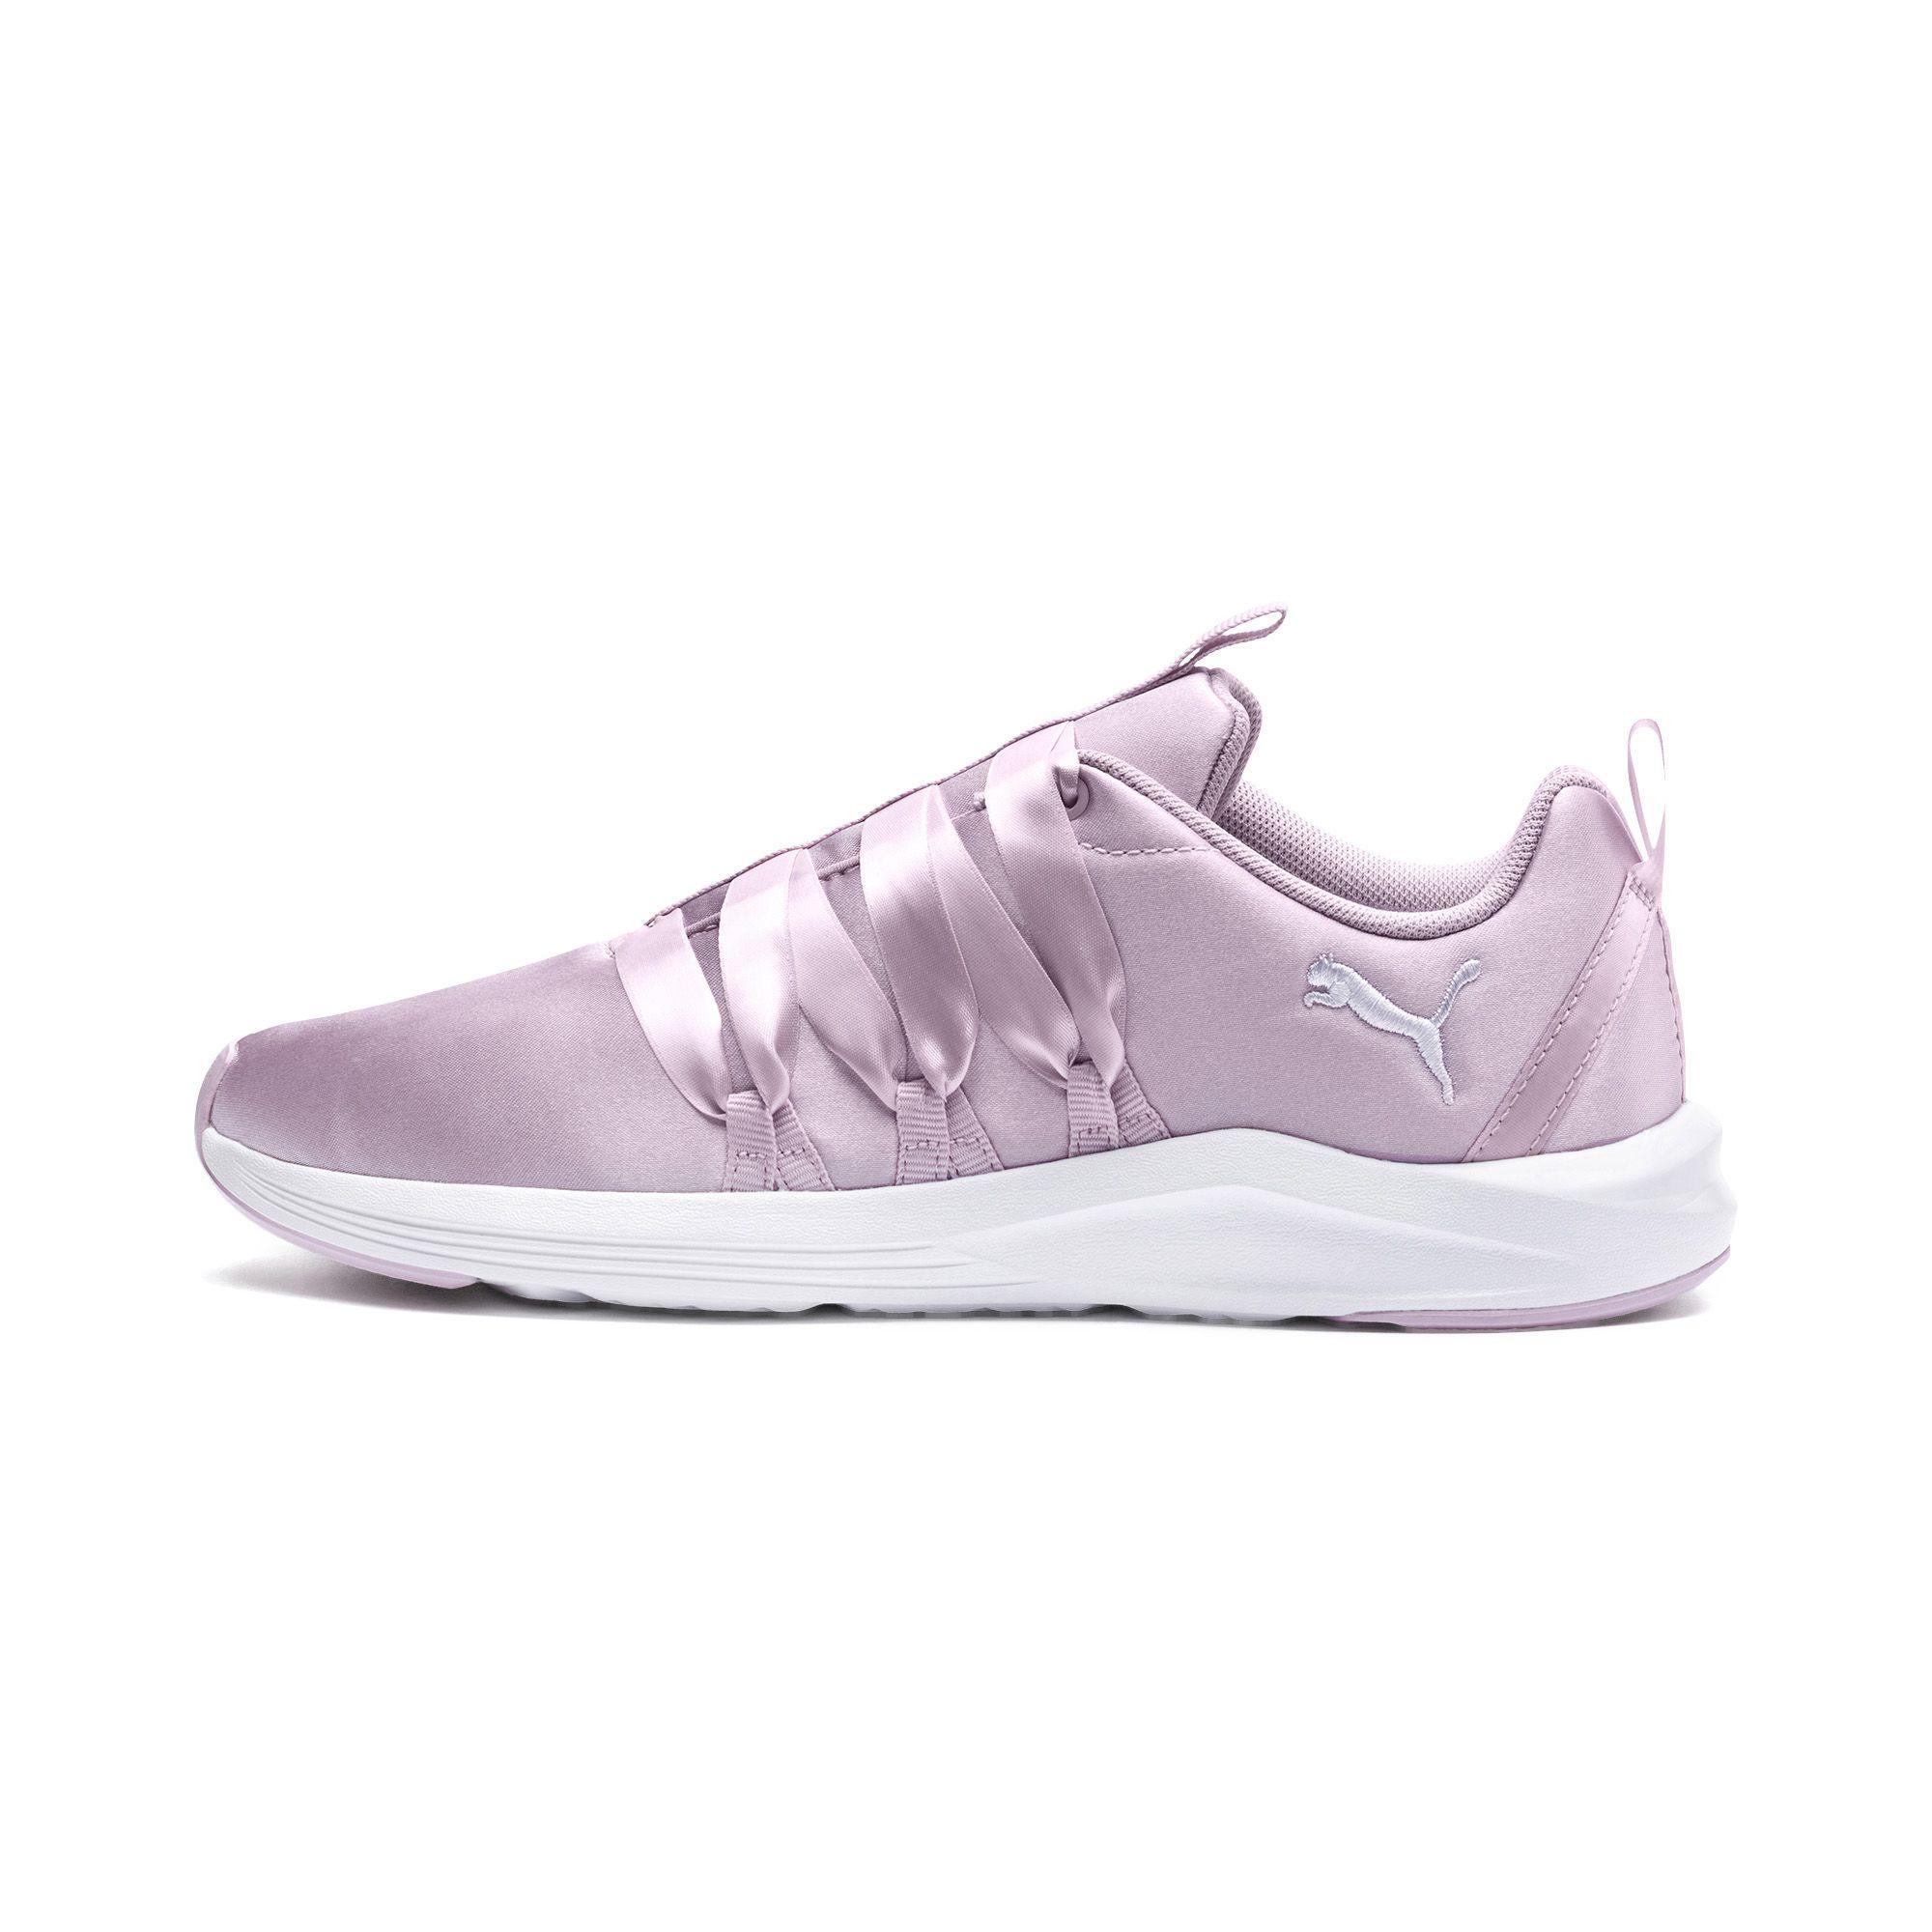 Lyst - PUMA Prowl Alt Satin Women s Training Shoes in Purple - Save 36% aaf97e8ac